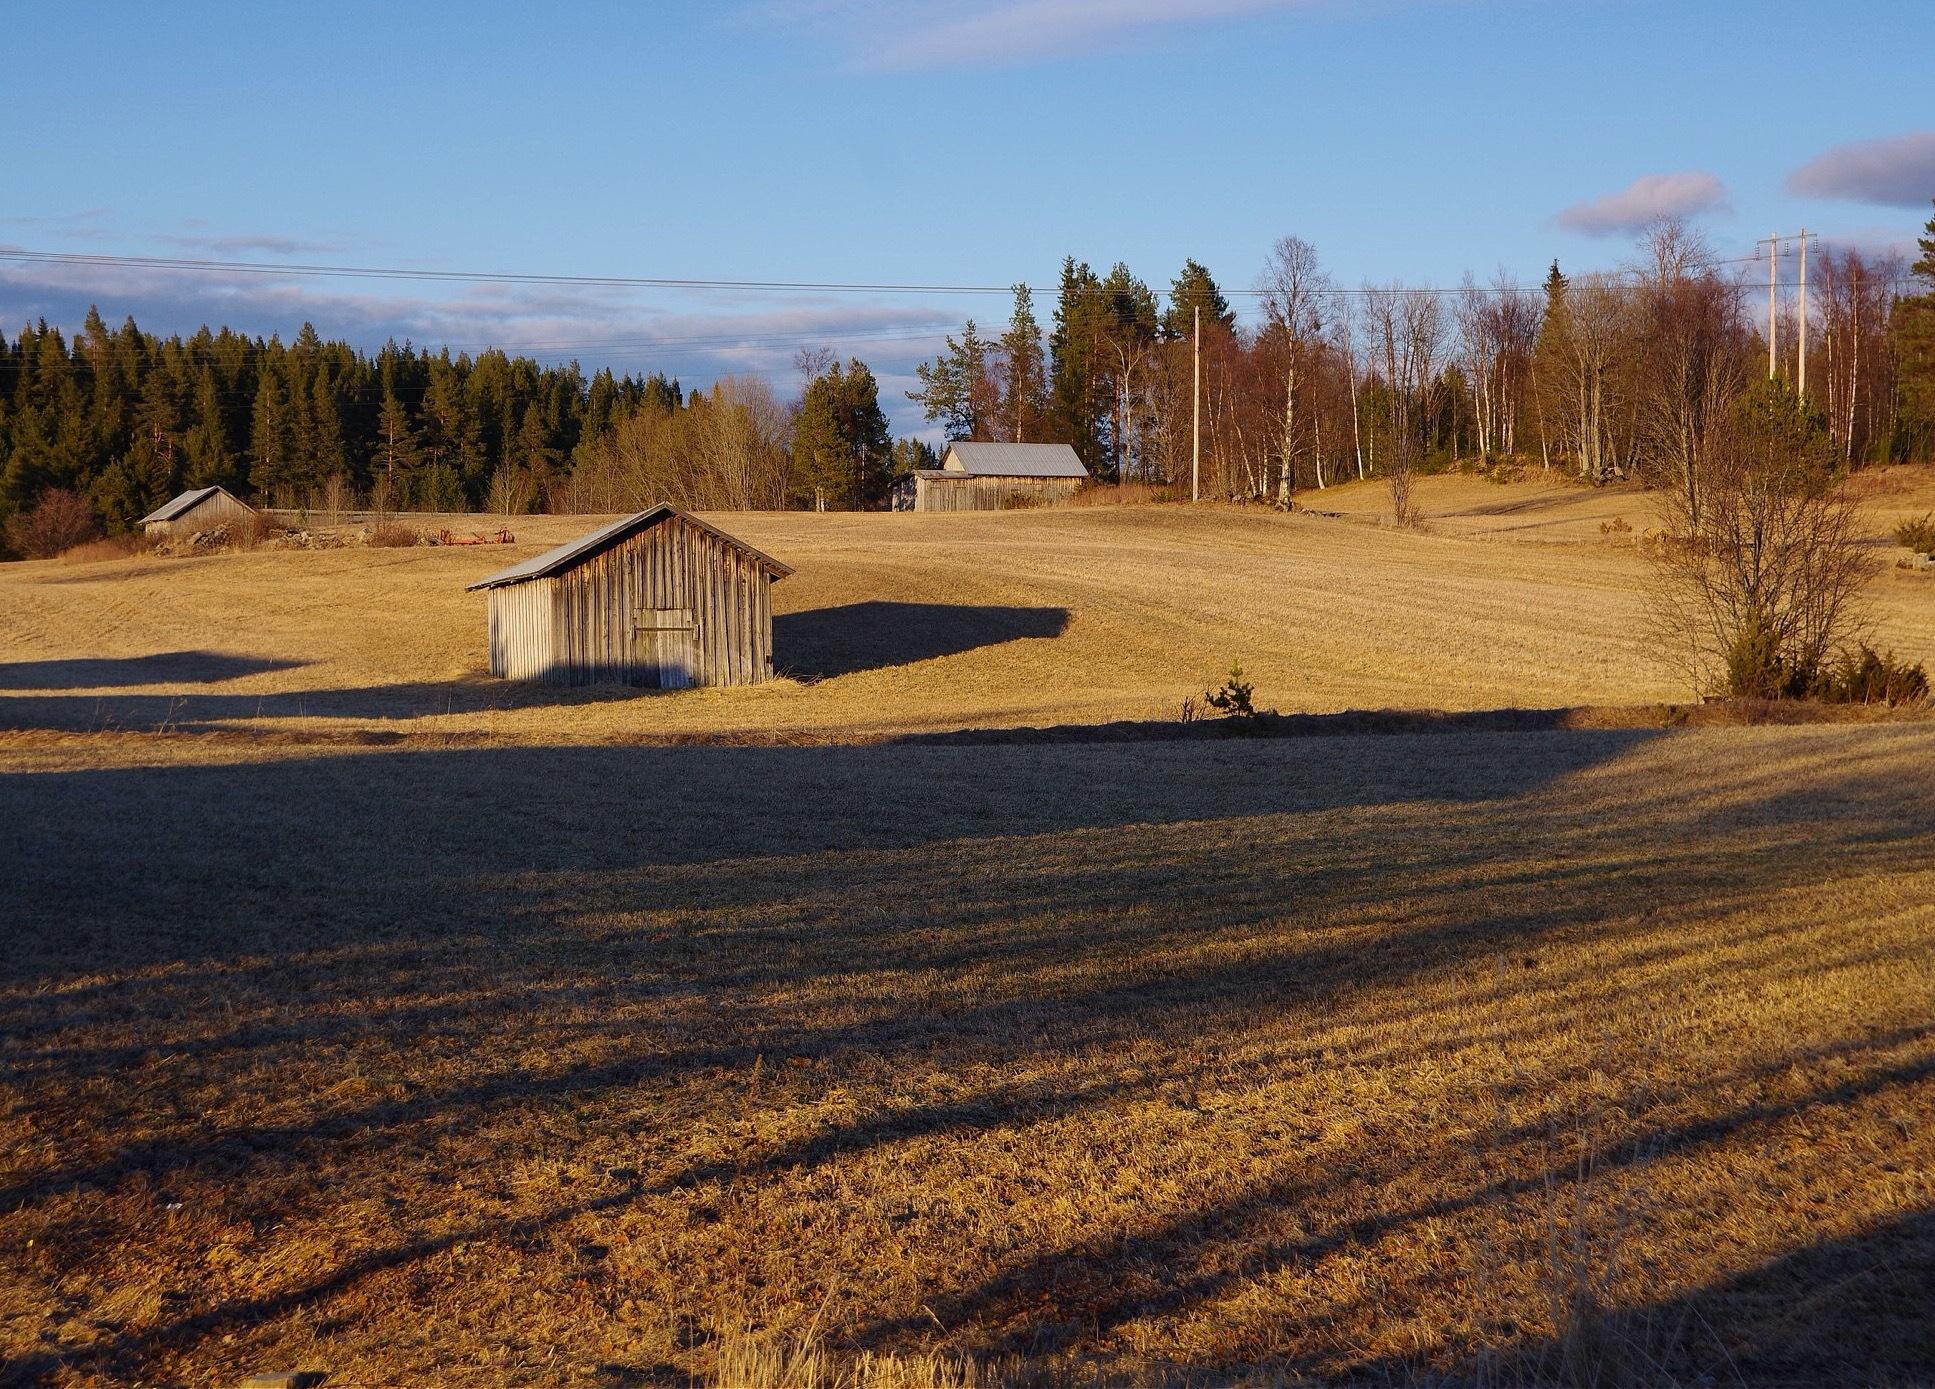 Spring in Jämtland, Sweden by lundhanders